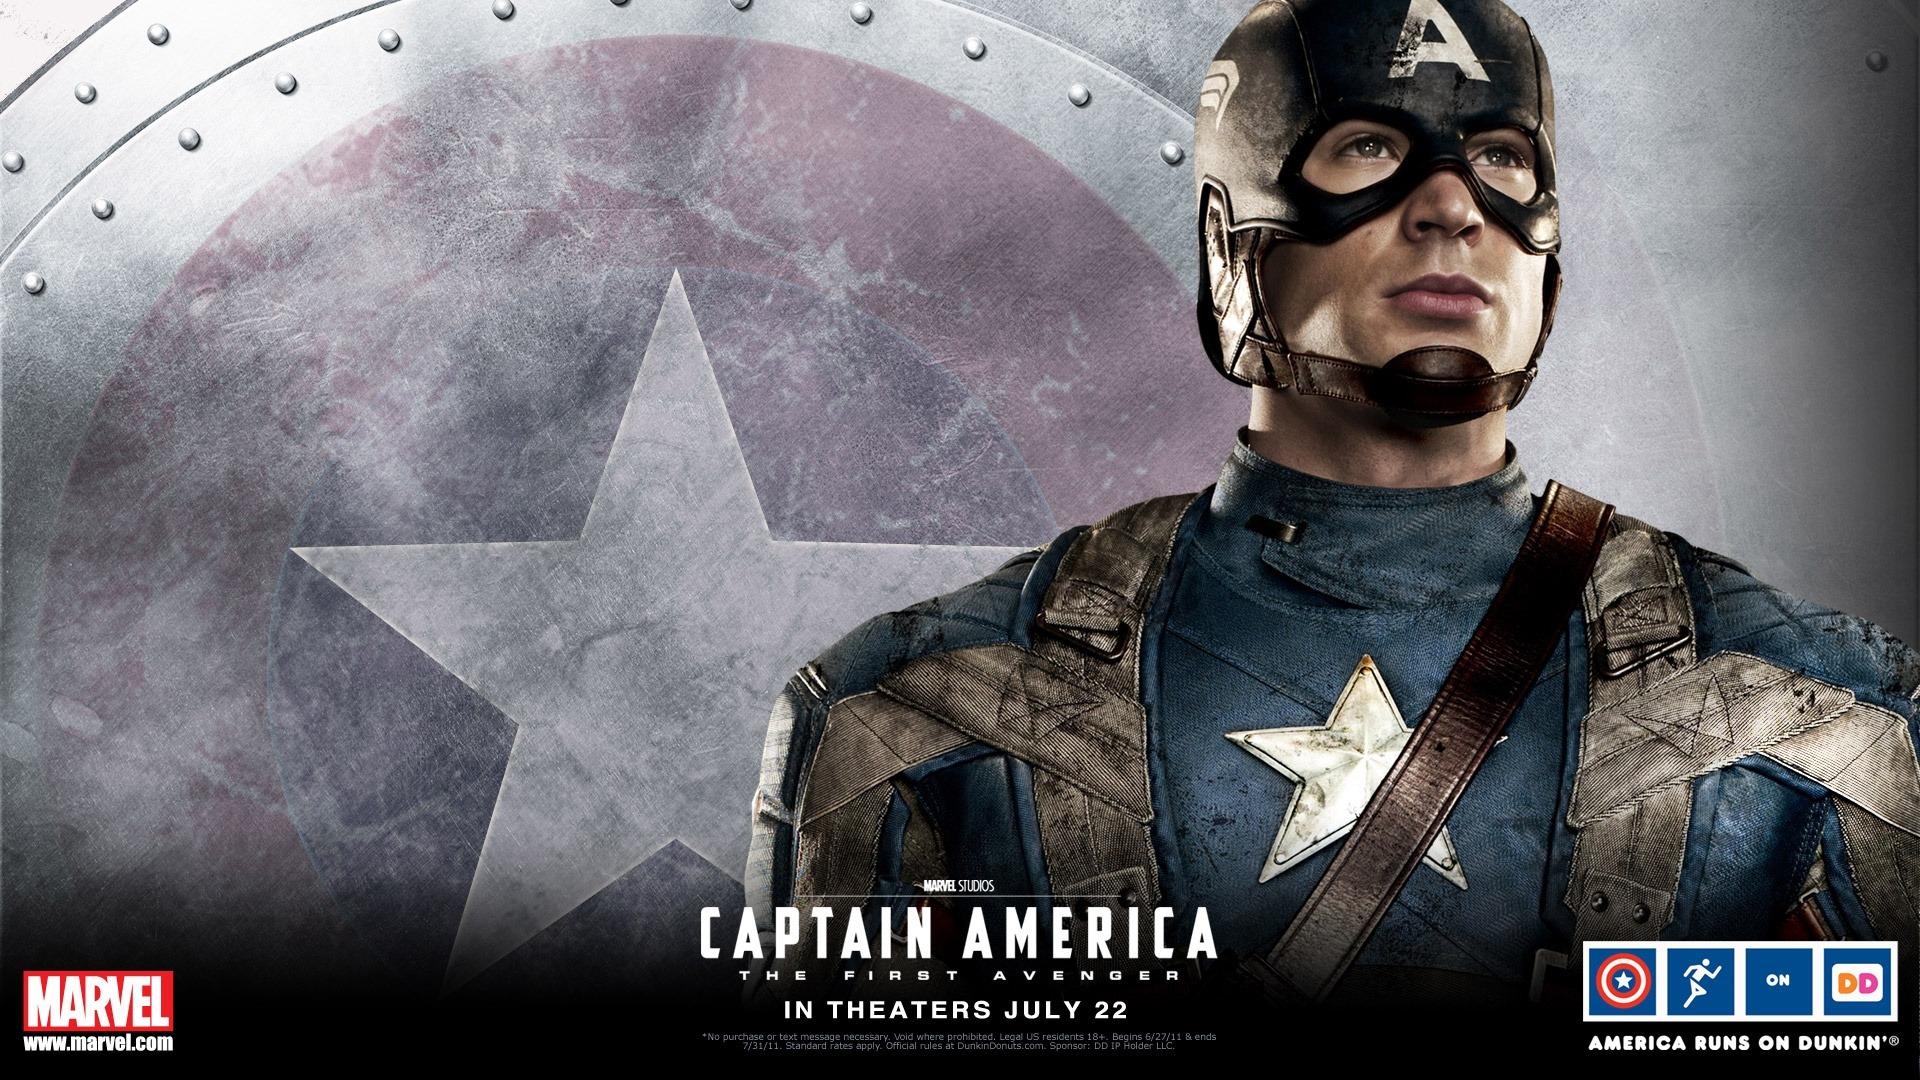 HD wallpapers 5   1920x1080 Wallpaper Download   Captain America 1920x1080